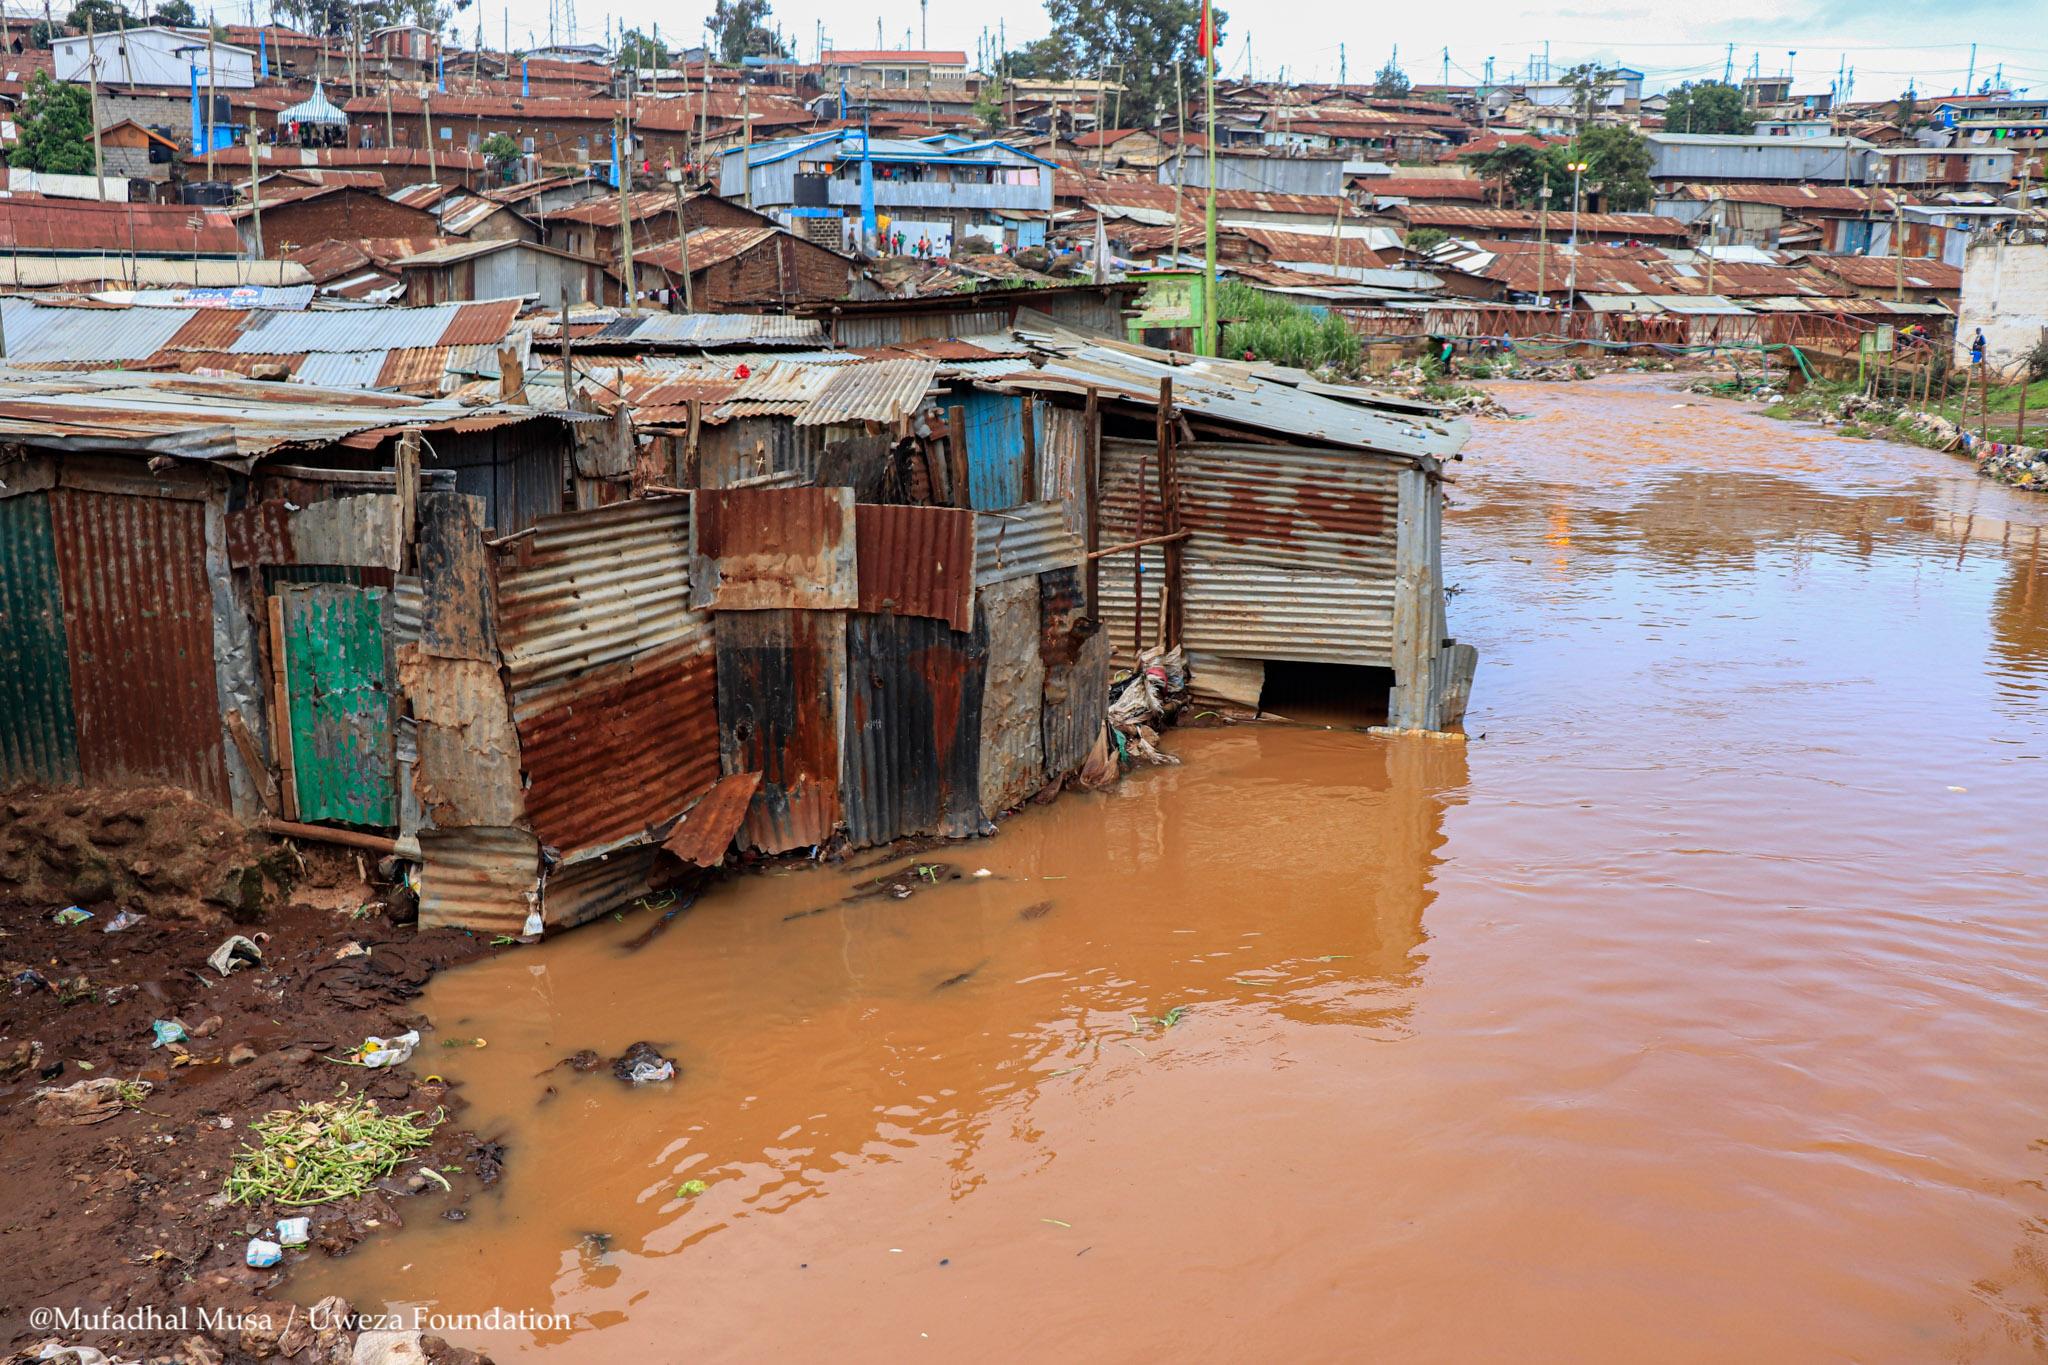 Heavy Rains in Kibera